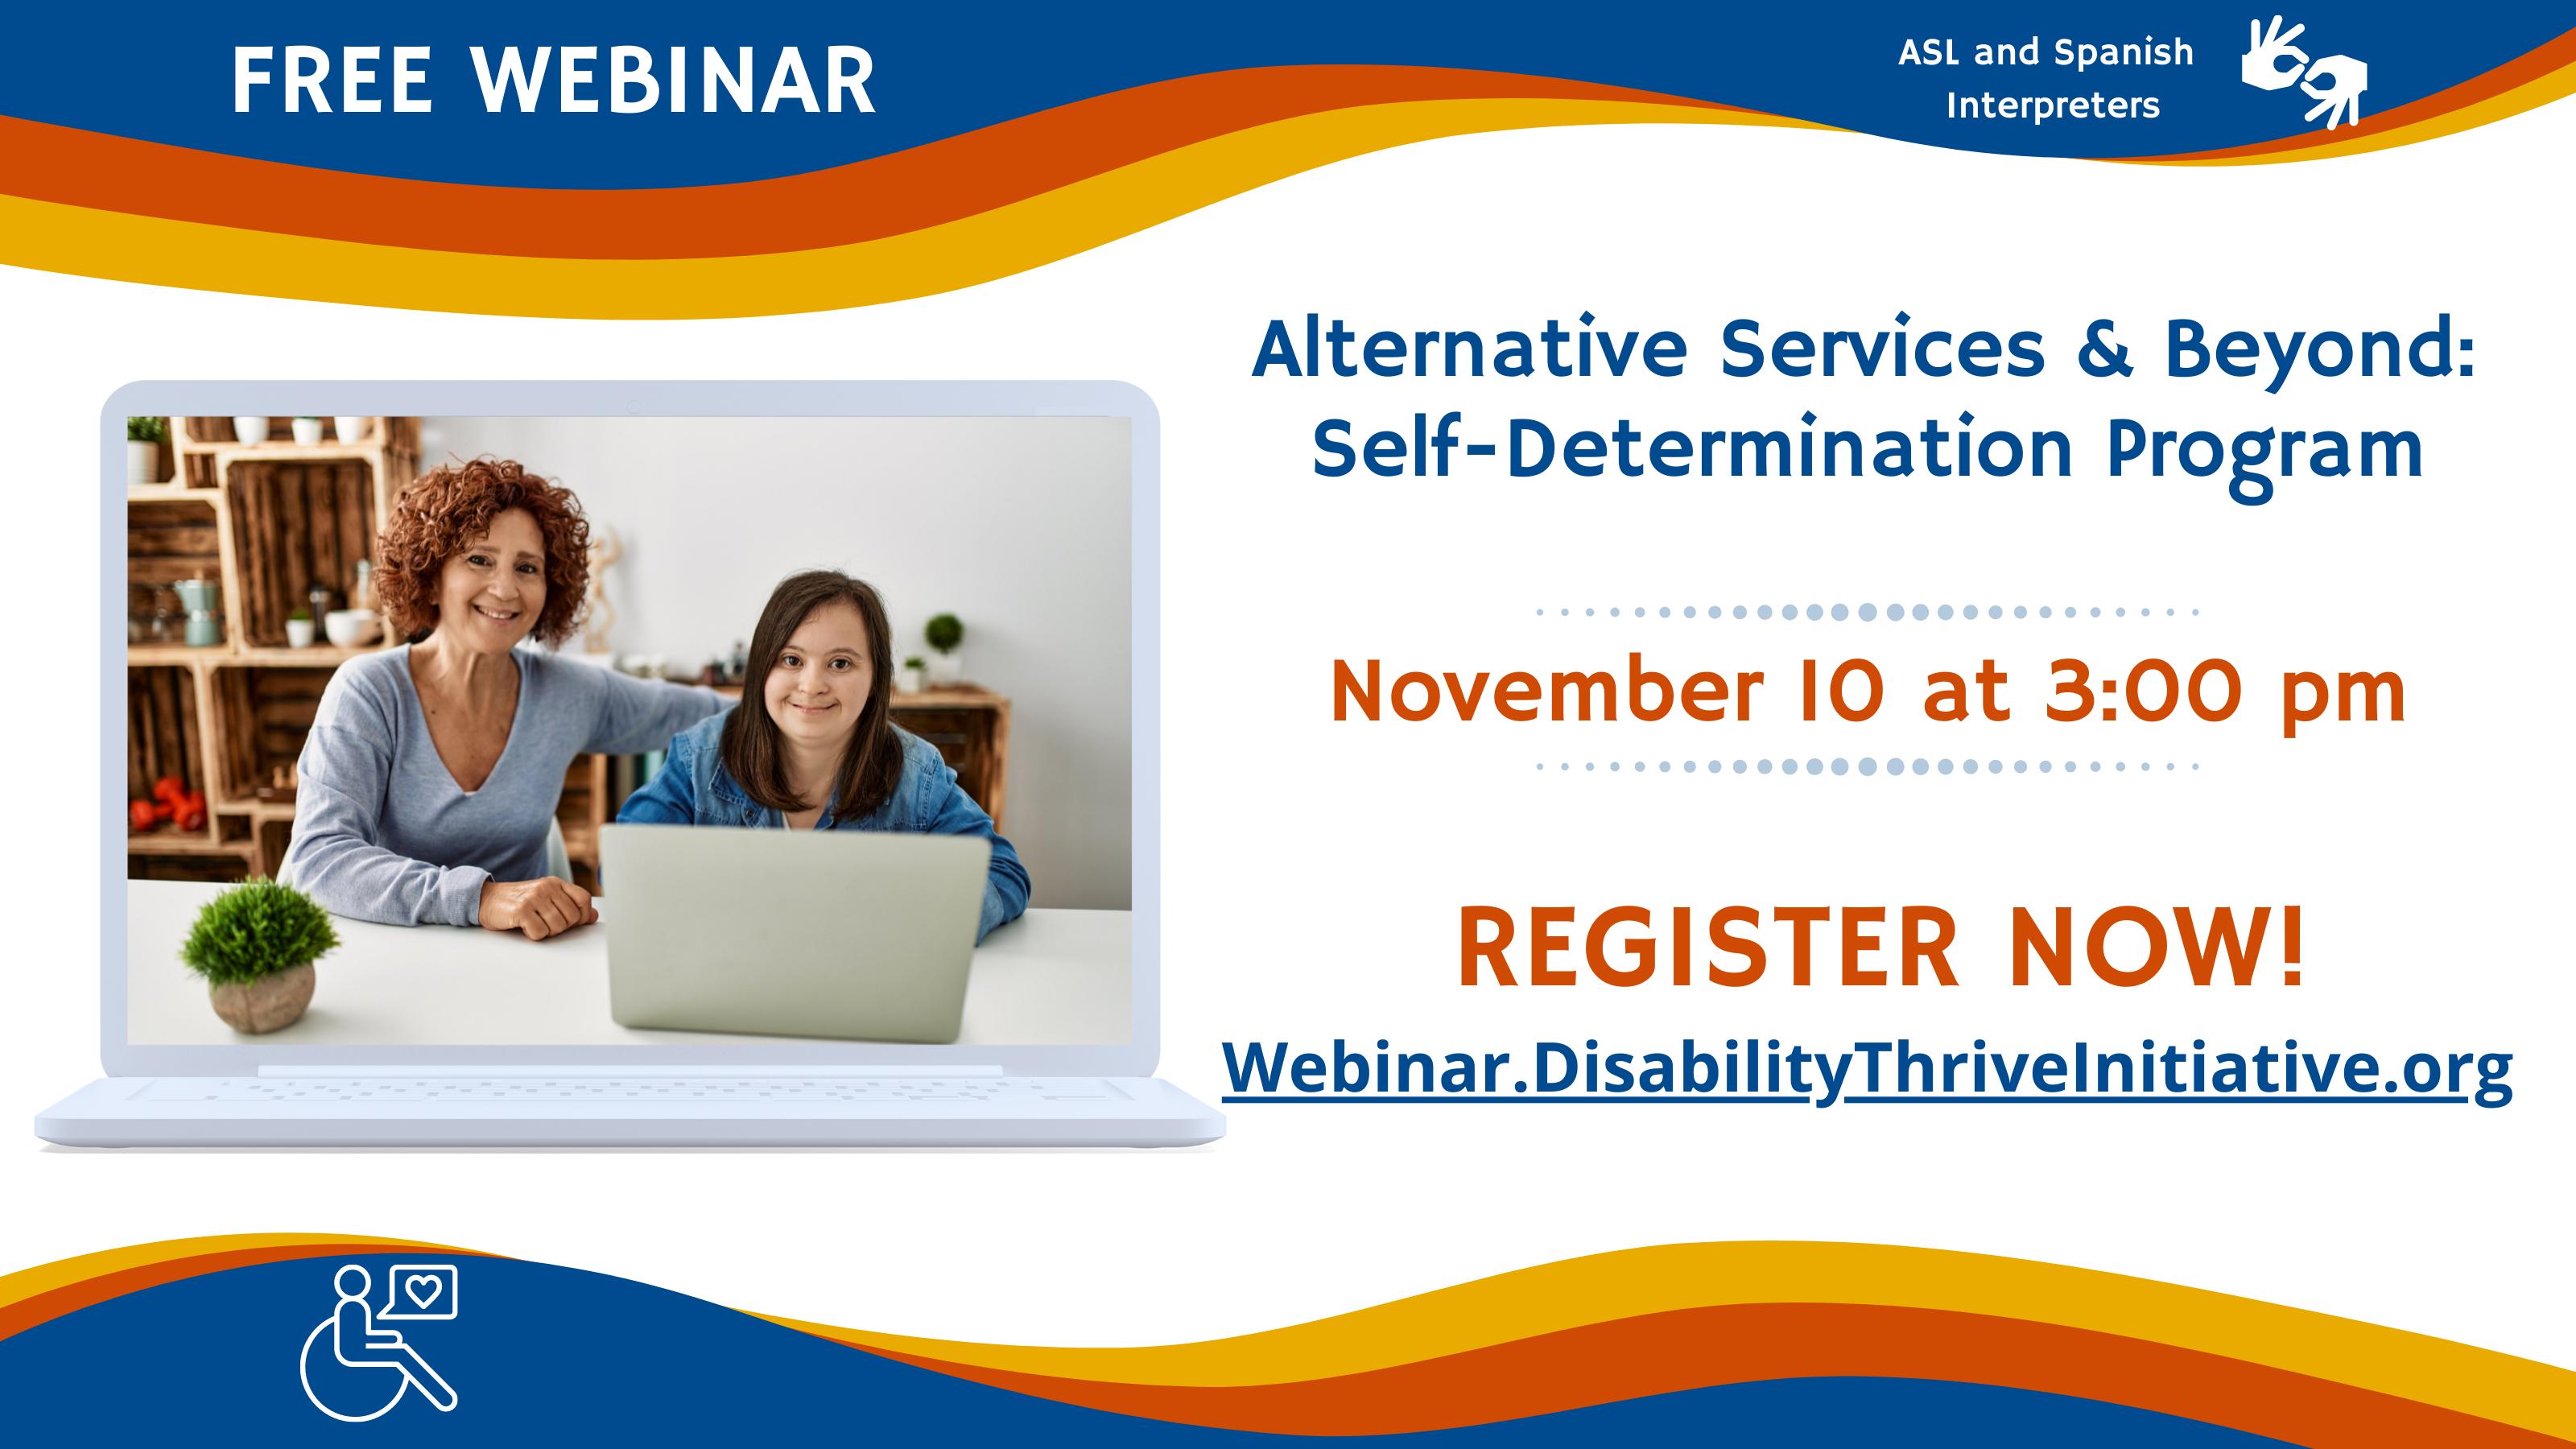 • Free Webinar. ASL and Spanish Interpreters. Wednesday, November 10, 2021 from 3 p.m. to 4:14 p.m. • Alternative Services & Beyond: Self Determination Program • Register Now at webinar.disabilitythriveinitiative.org